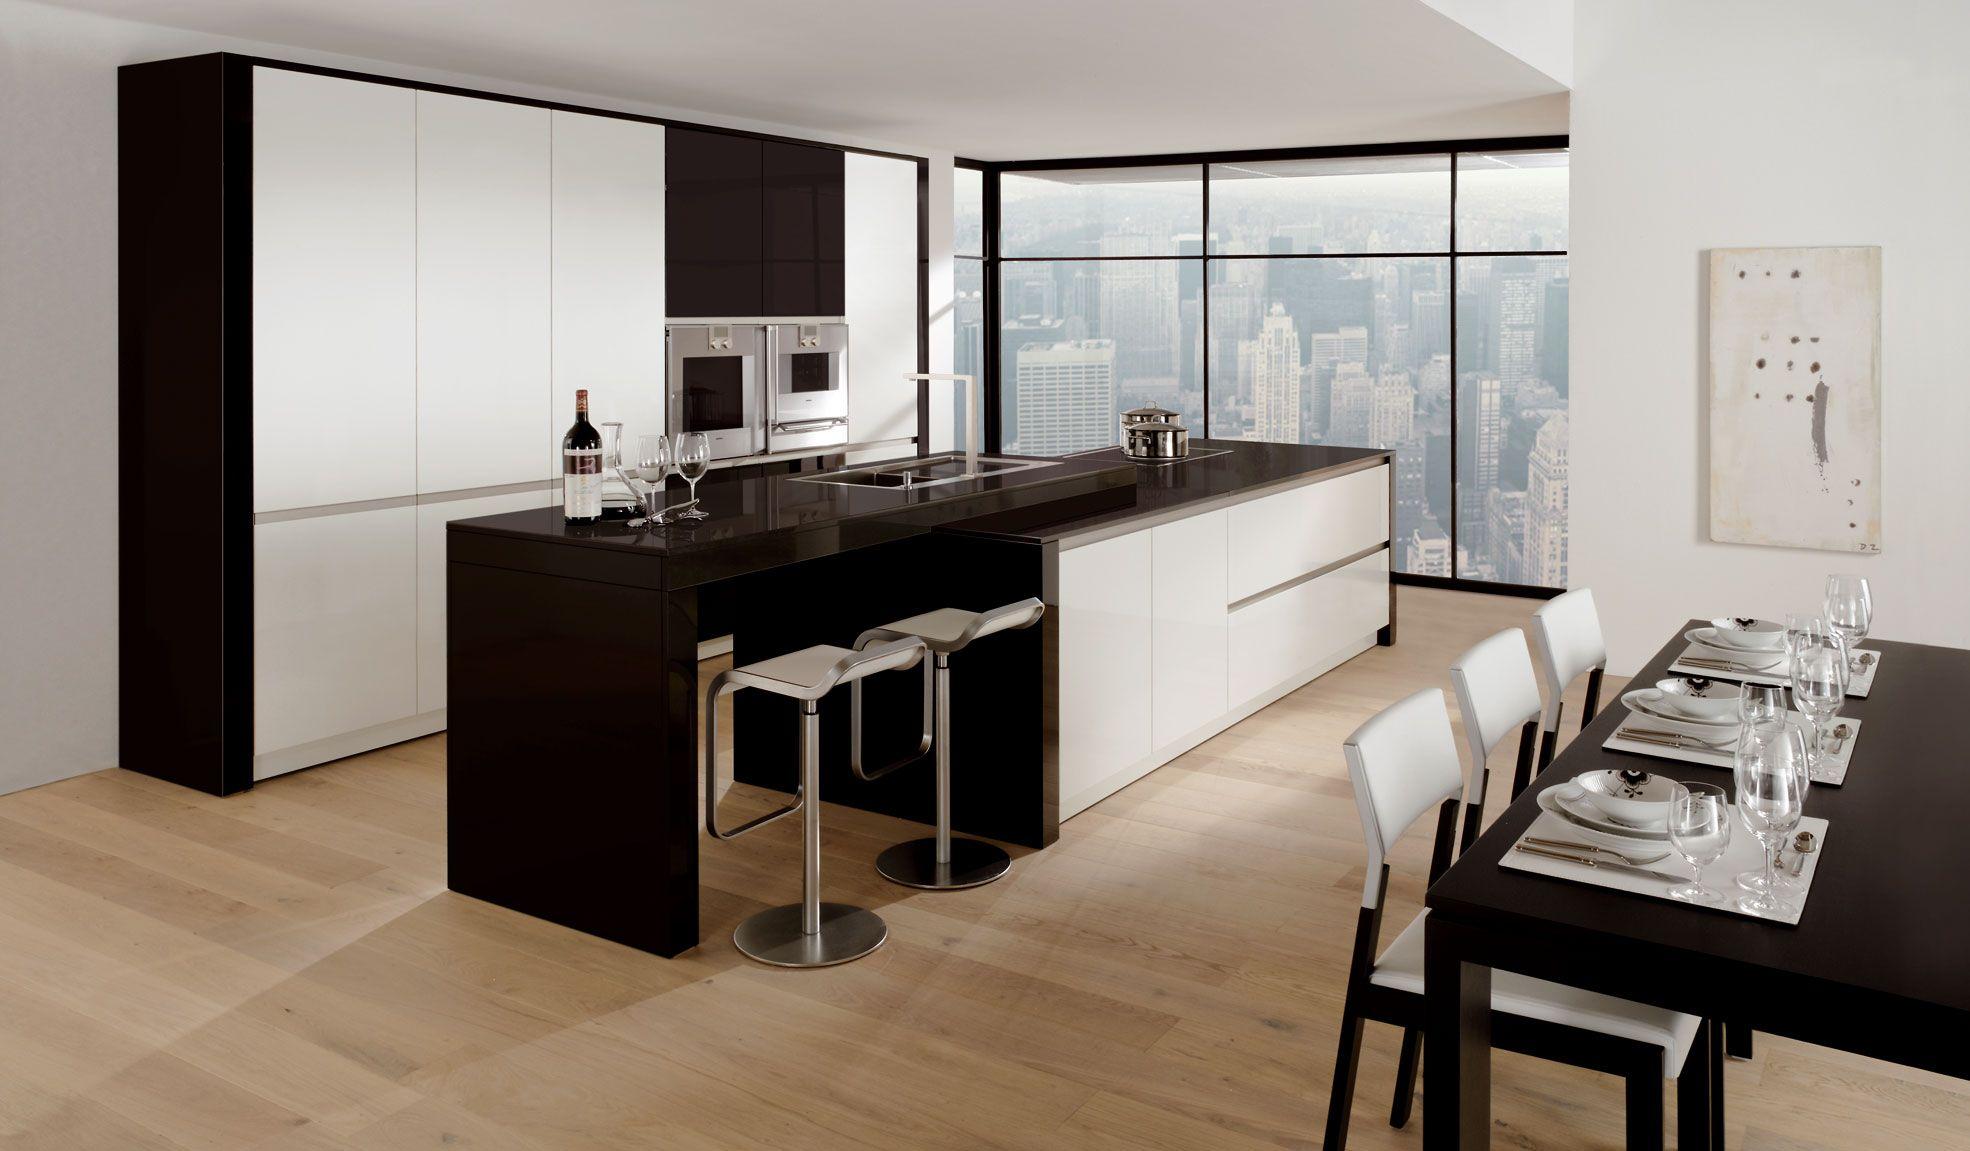 Cocina sin tiradores laca alto brillo blanca acentuada en for Encimera negra brillo